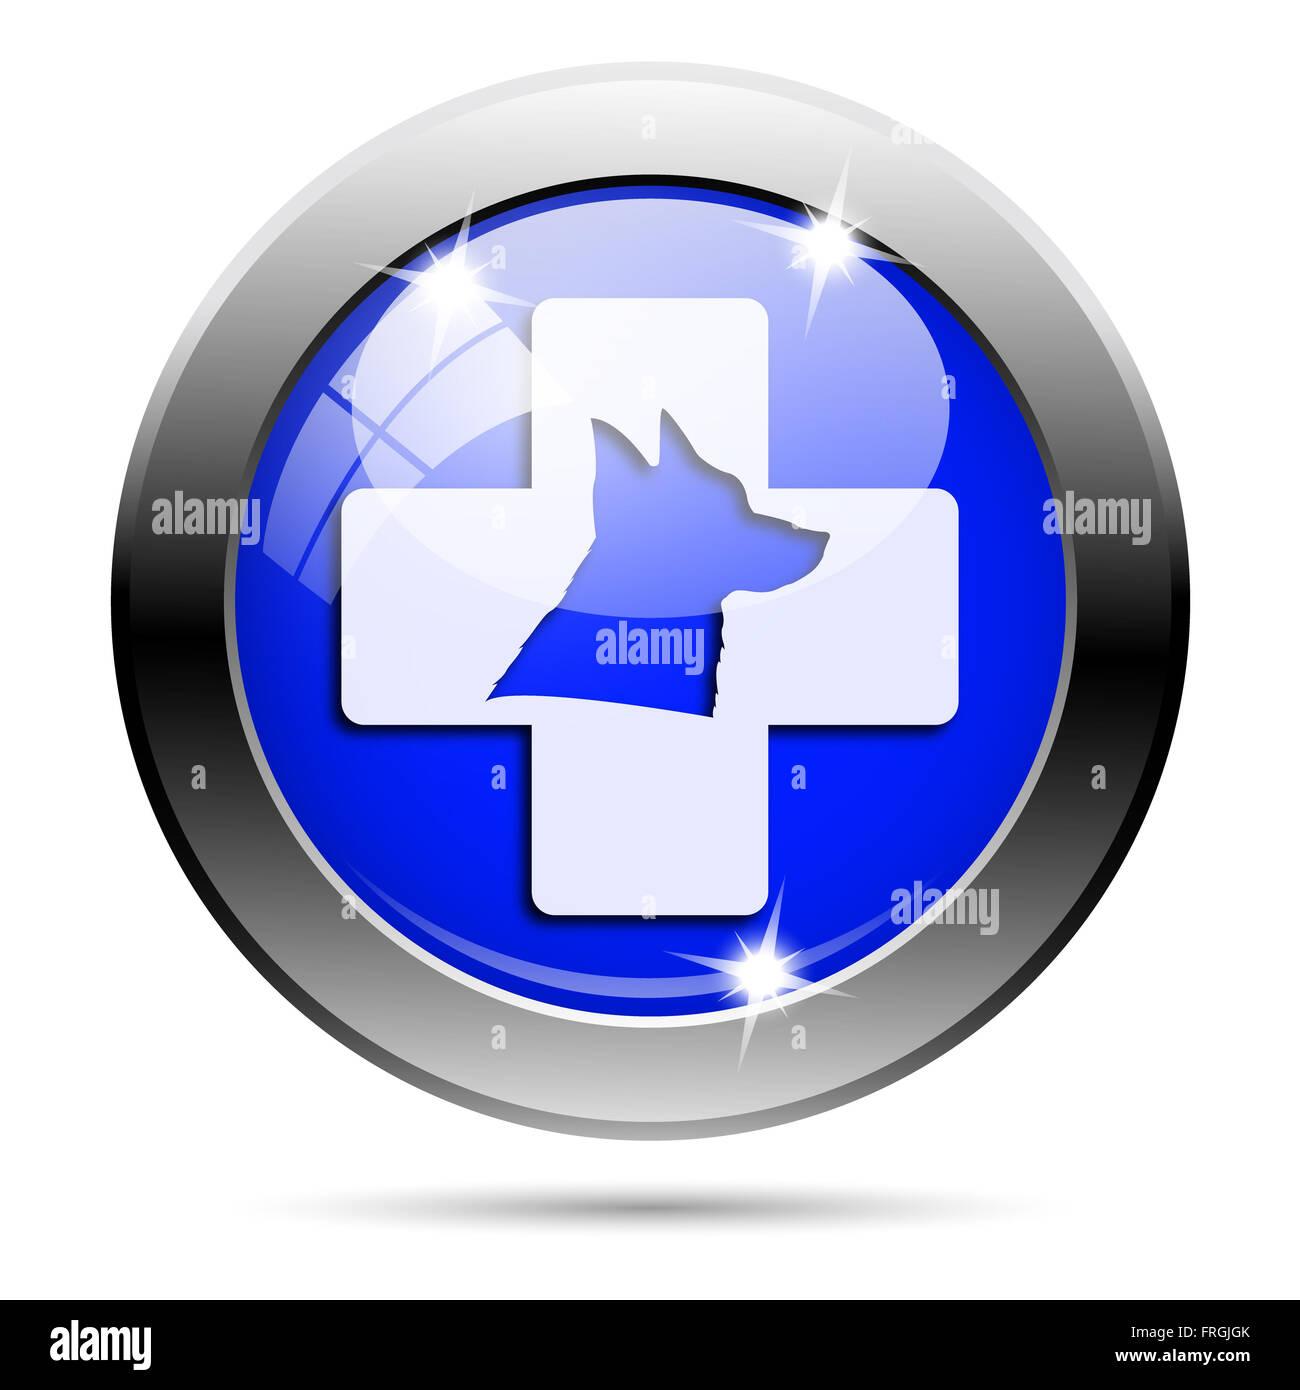 Metallic round glossy icon with white design on blue background - Stock Image